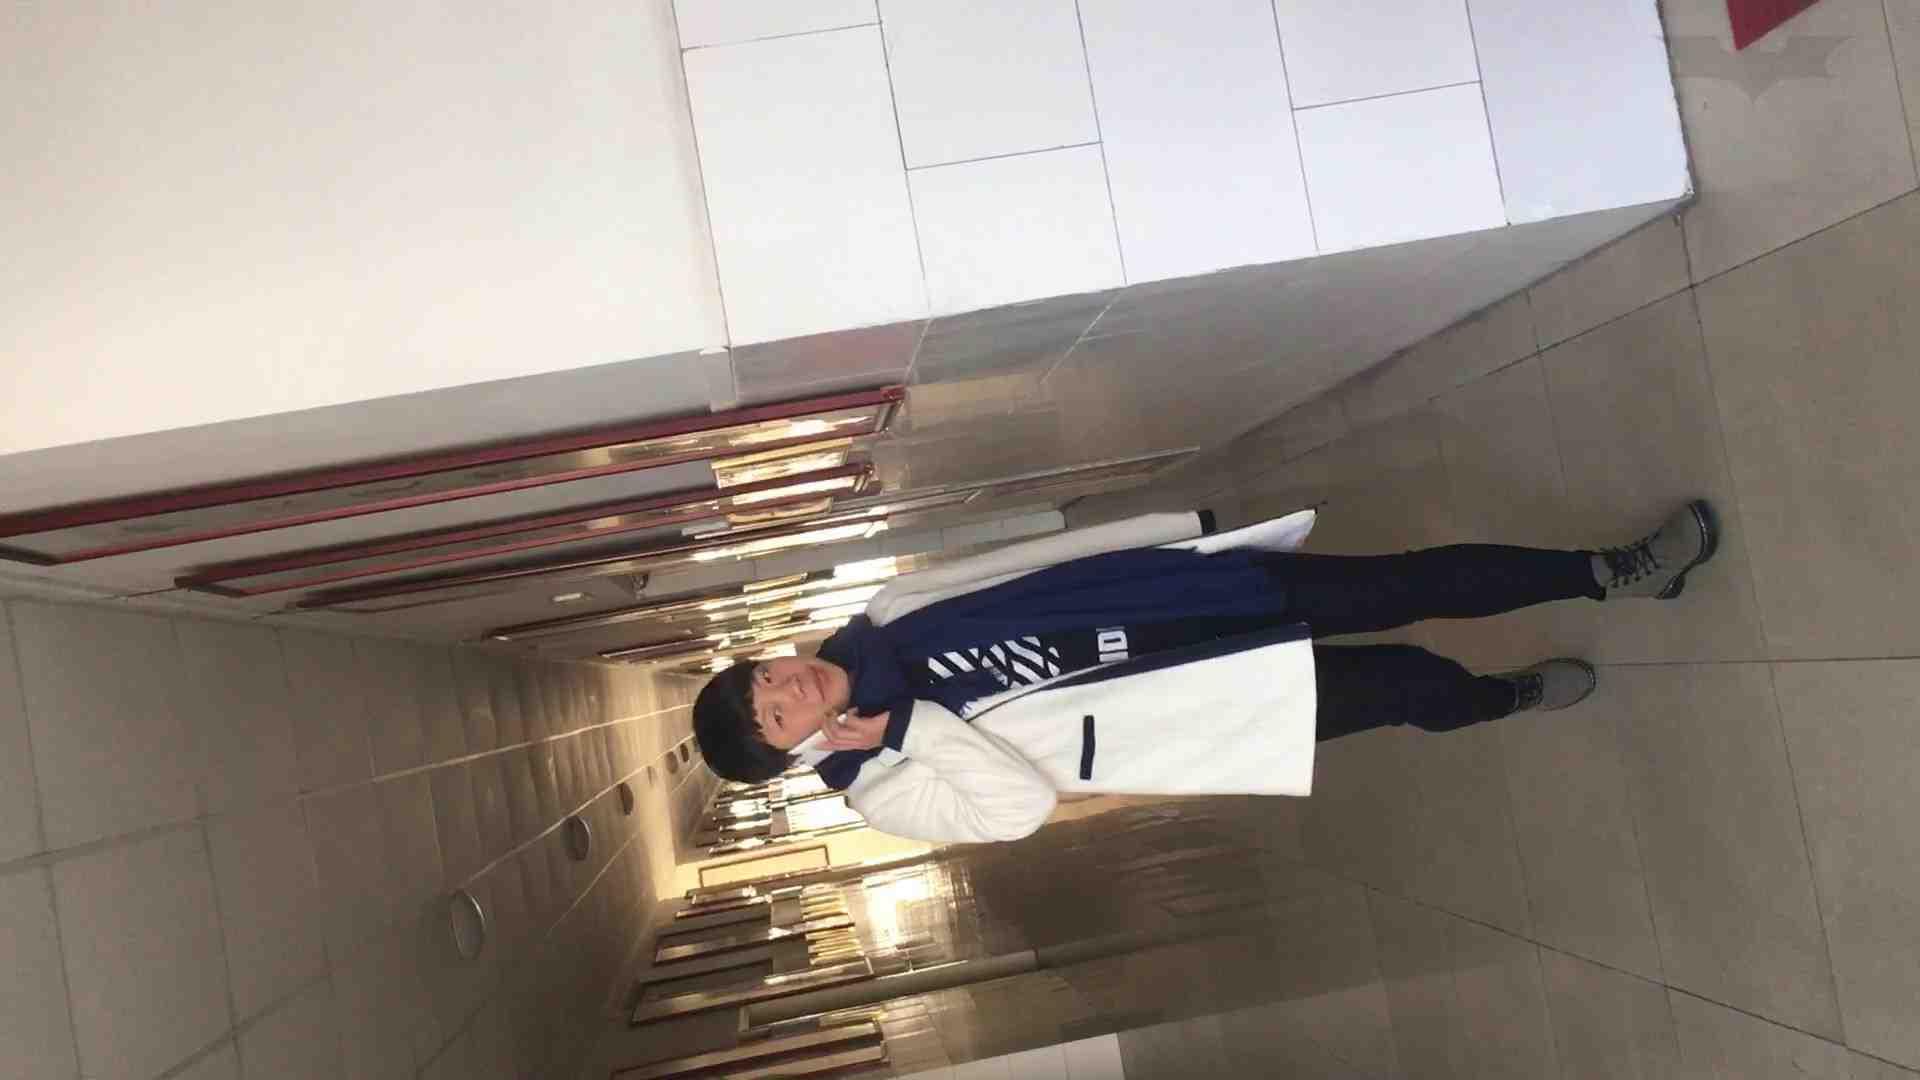 芸術大学ガチ潜入盗撮 JD盗撮 美女の洗面所の秘密 Vol.81 美肌 エロ画像 100枚 29